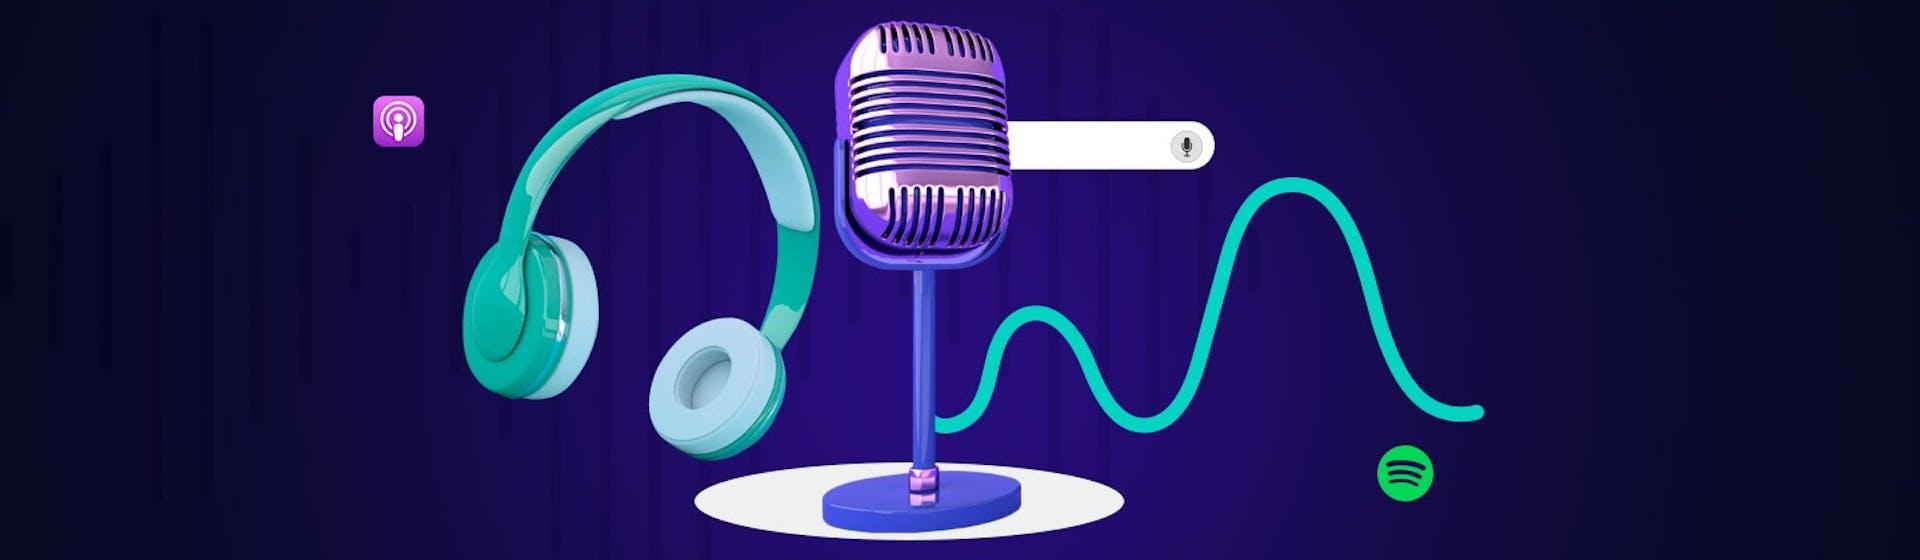 ¿Buscas temas para podcast? 25 ideas para conseguir tus primeros seguidores